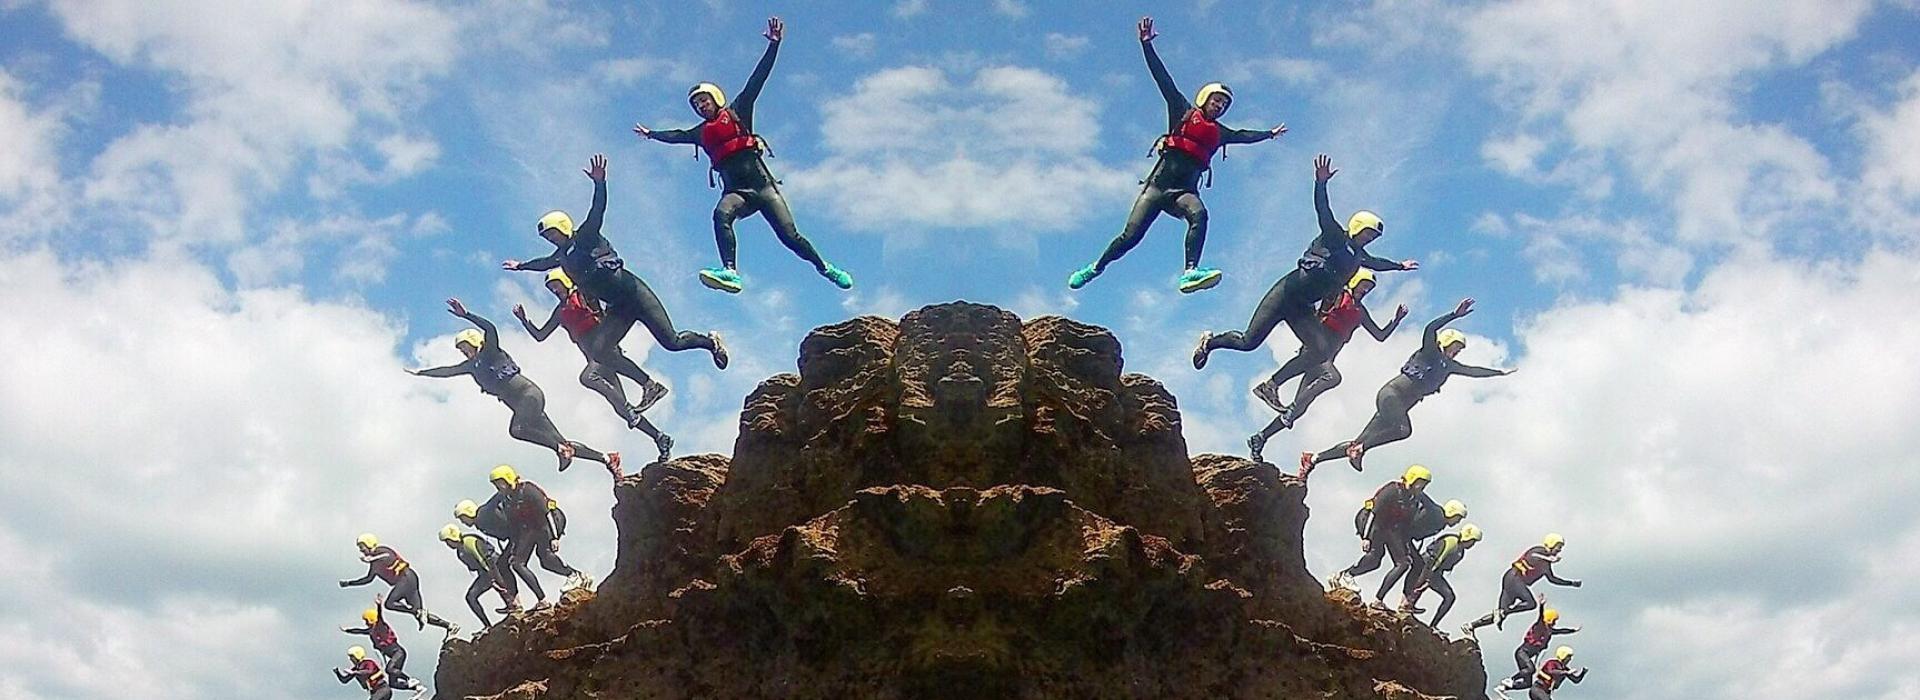 devon coasteering, watersports, adventure, jump